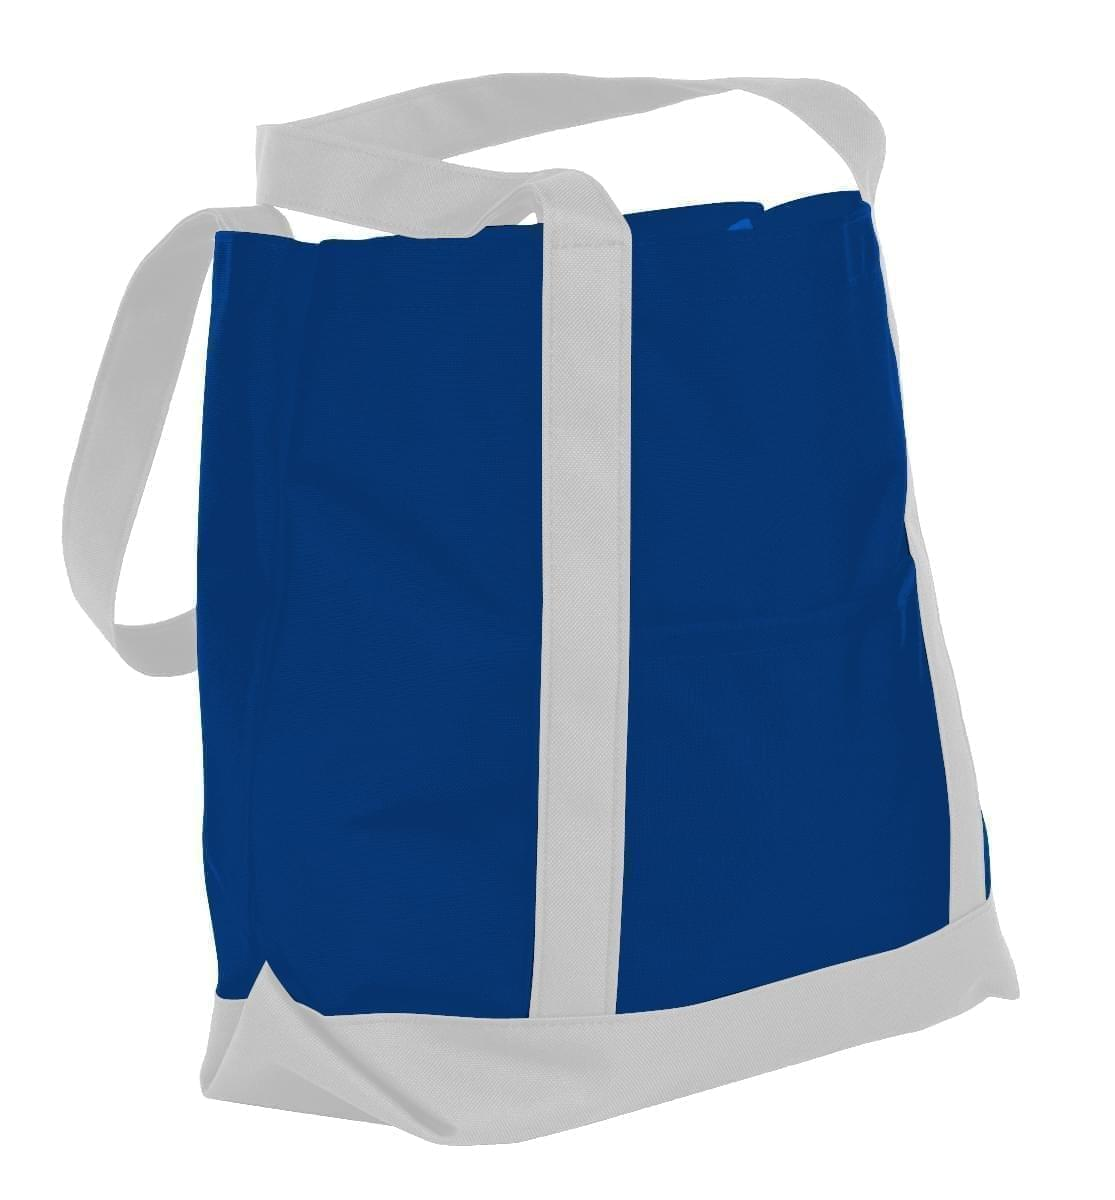 USA Made Nylon Poly Boat Tote Bags, Royal Blue-White, XAACL1UA0P